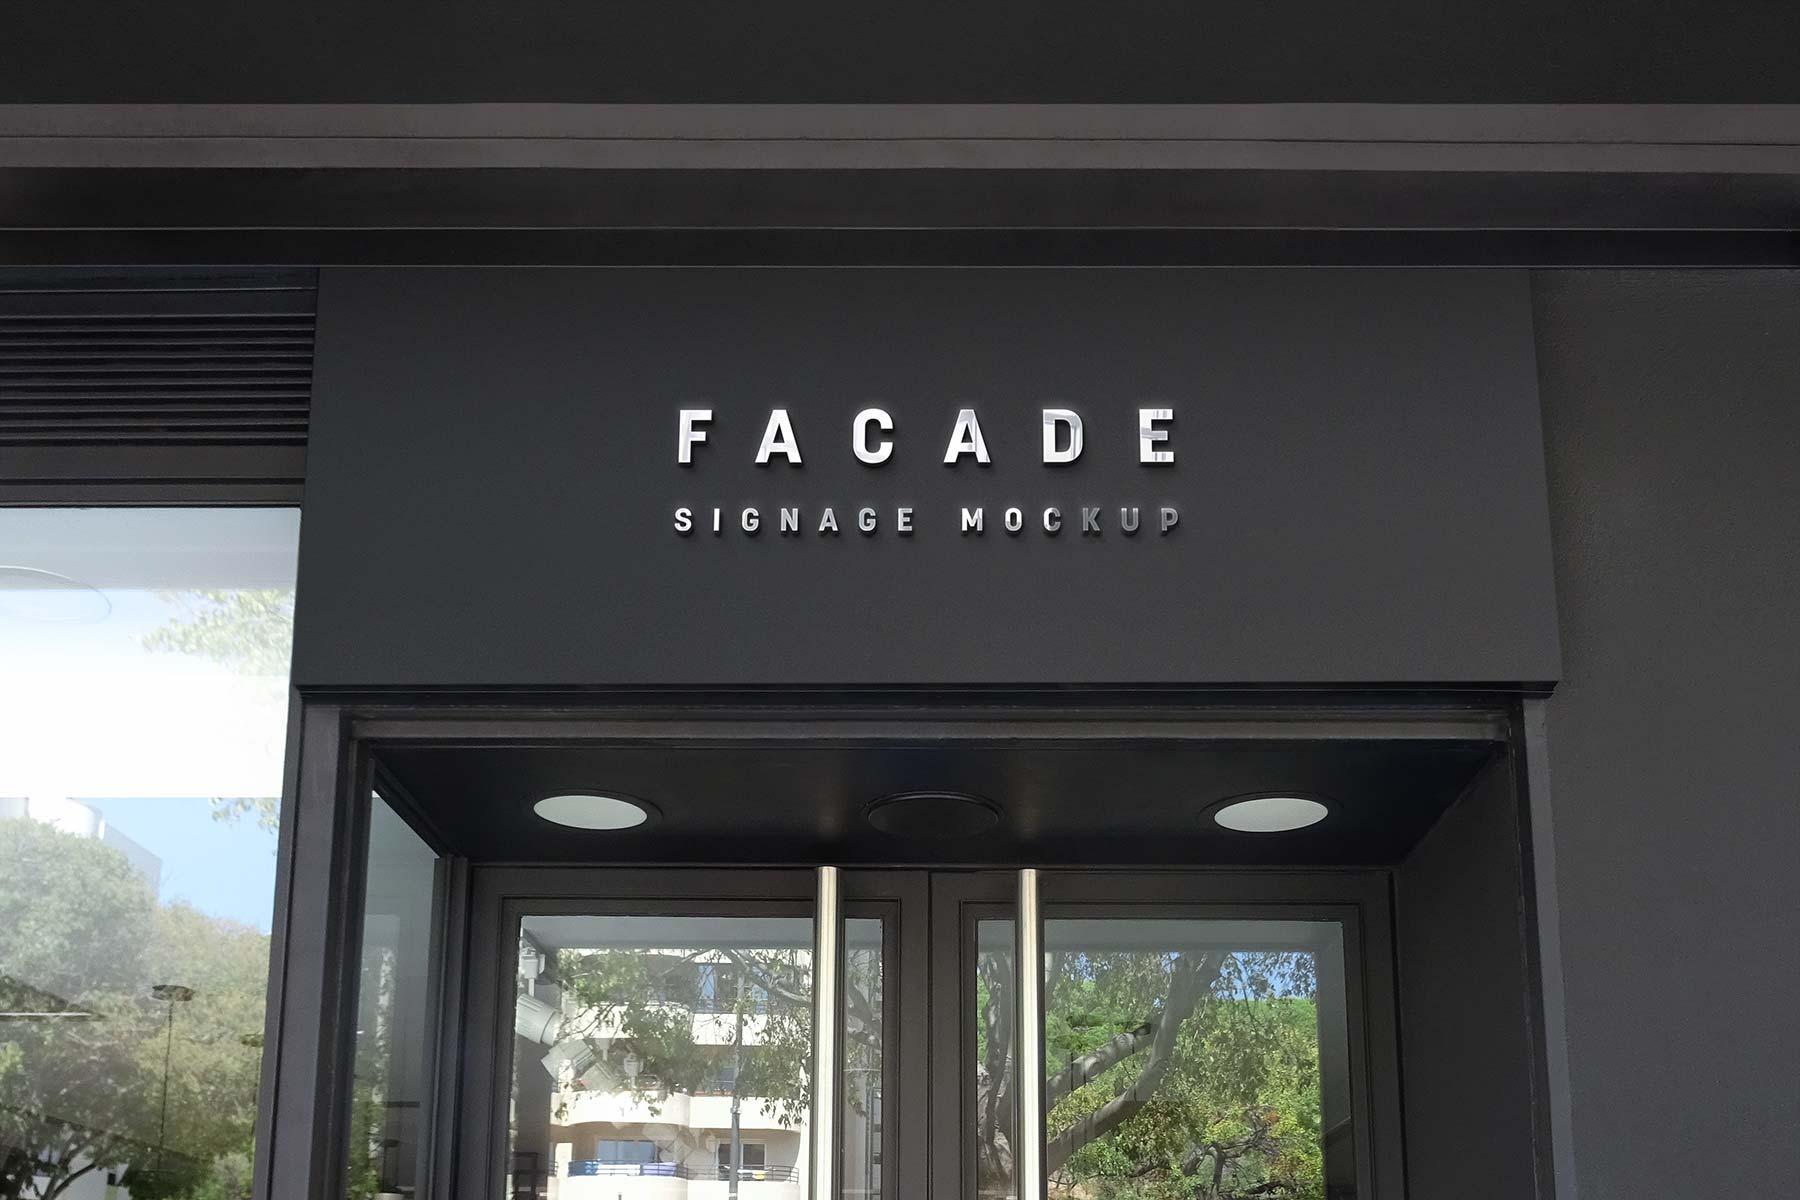 Free-Facade-Shop-Signboard-Mockup-PSD